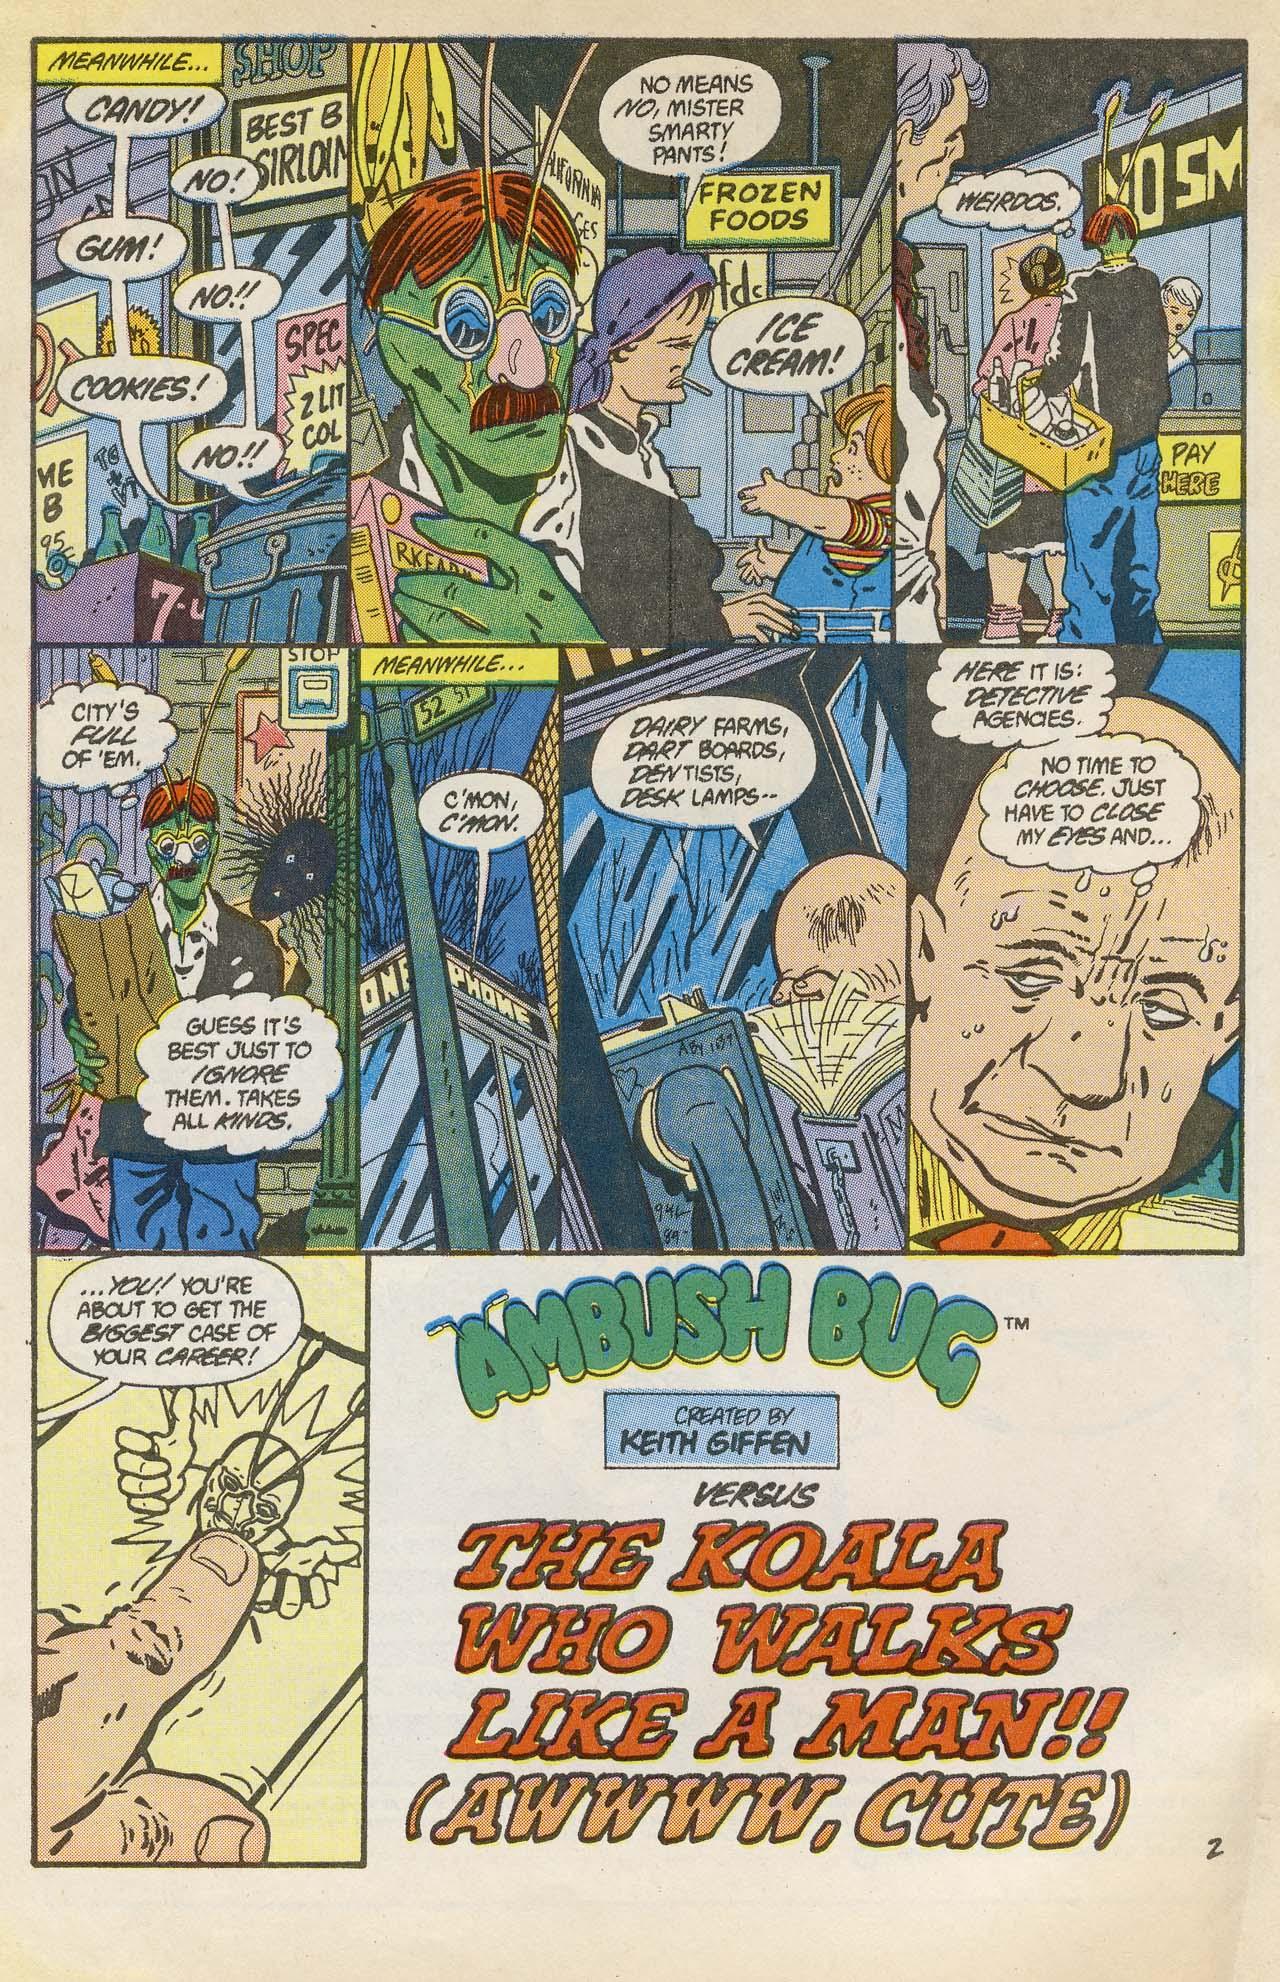 Read online Ambush Bug comic -  Issue #2 - 4